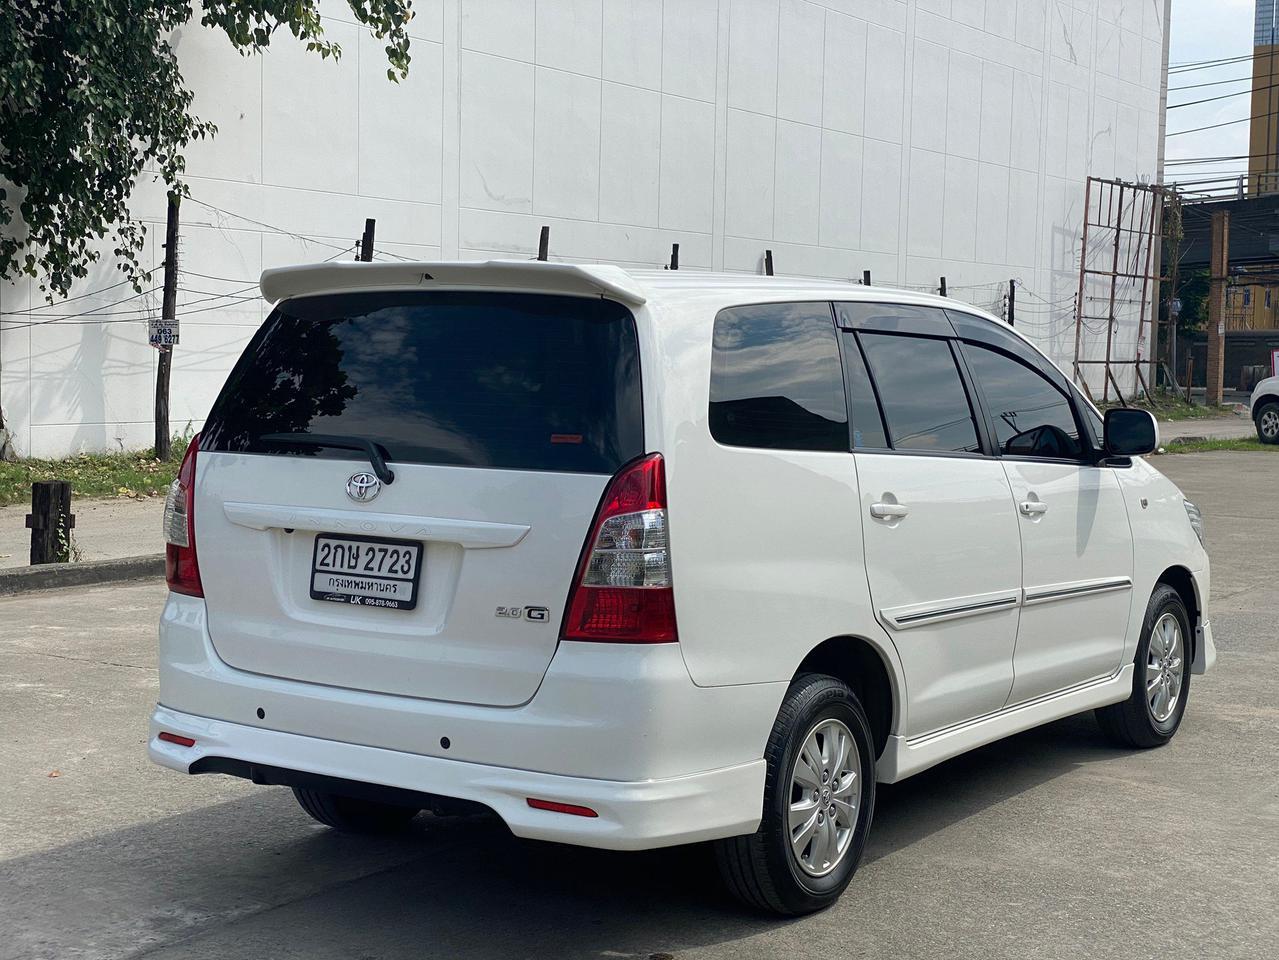 "Toyota Innova 2.0G ออฟชั่น ทีวี จอกลาง กล้องถอยหลังและเซ็นเซอร์ มาให้พร้อมใช้งานเลยครับ"" การเชื่อมต่อ Bluetooth  รูปที่ 4"